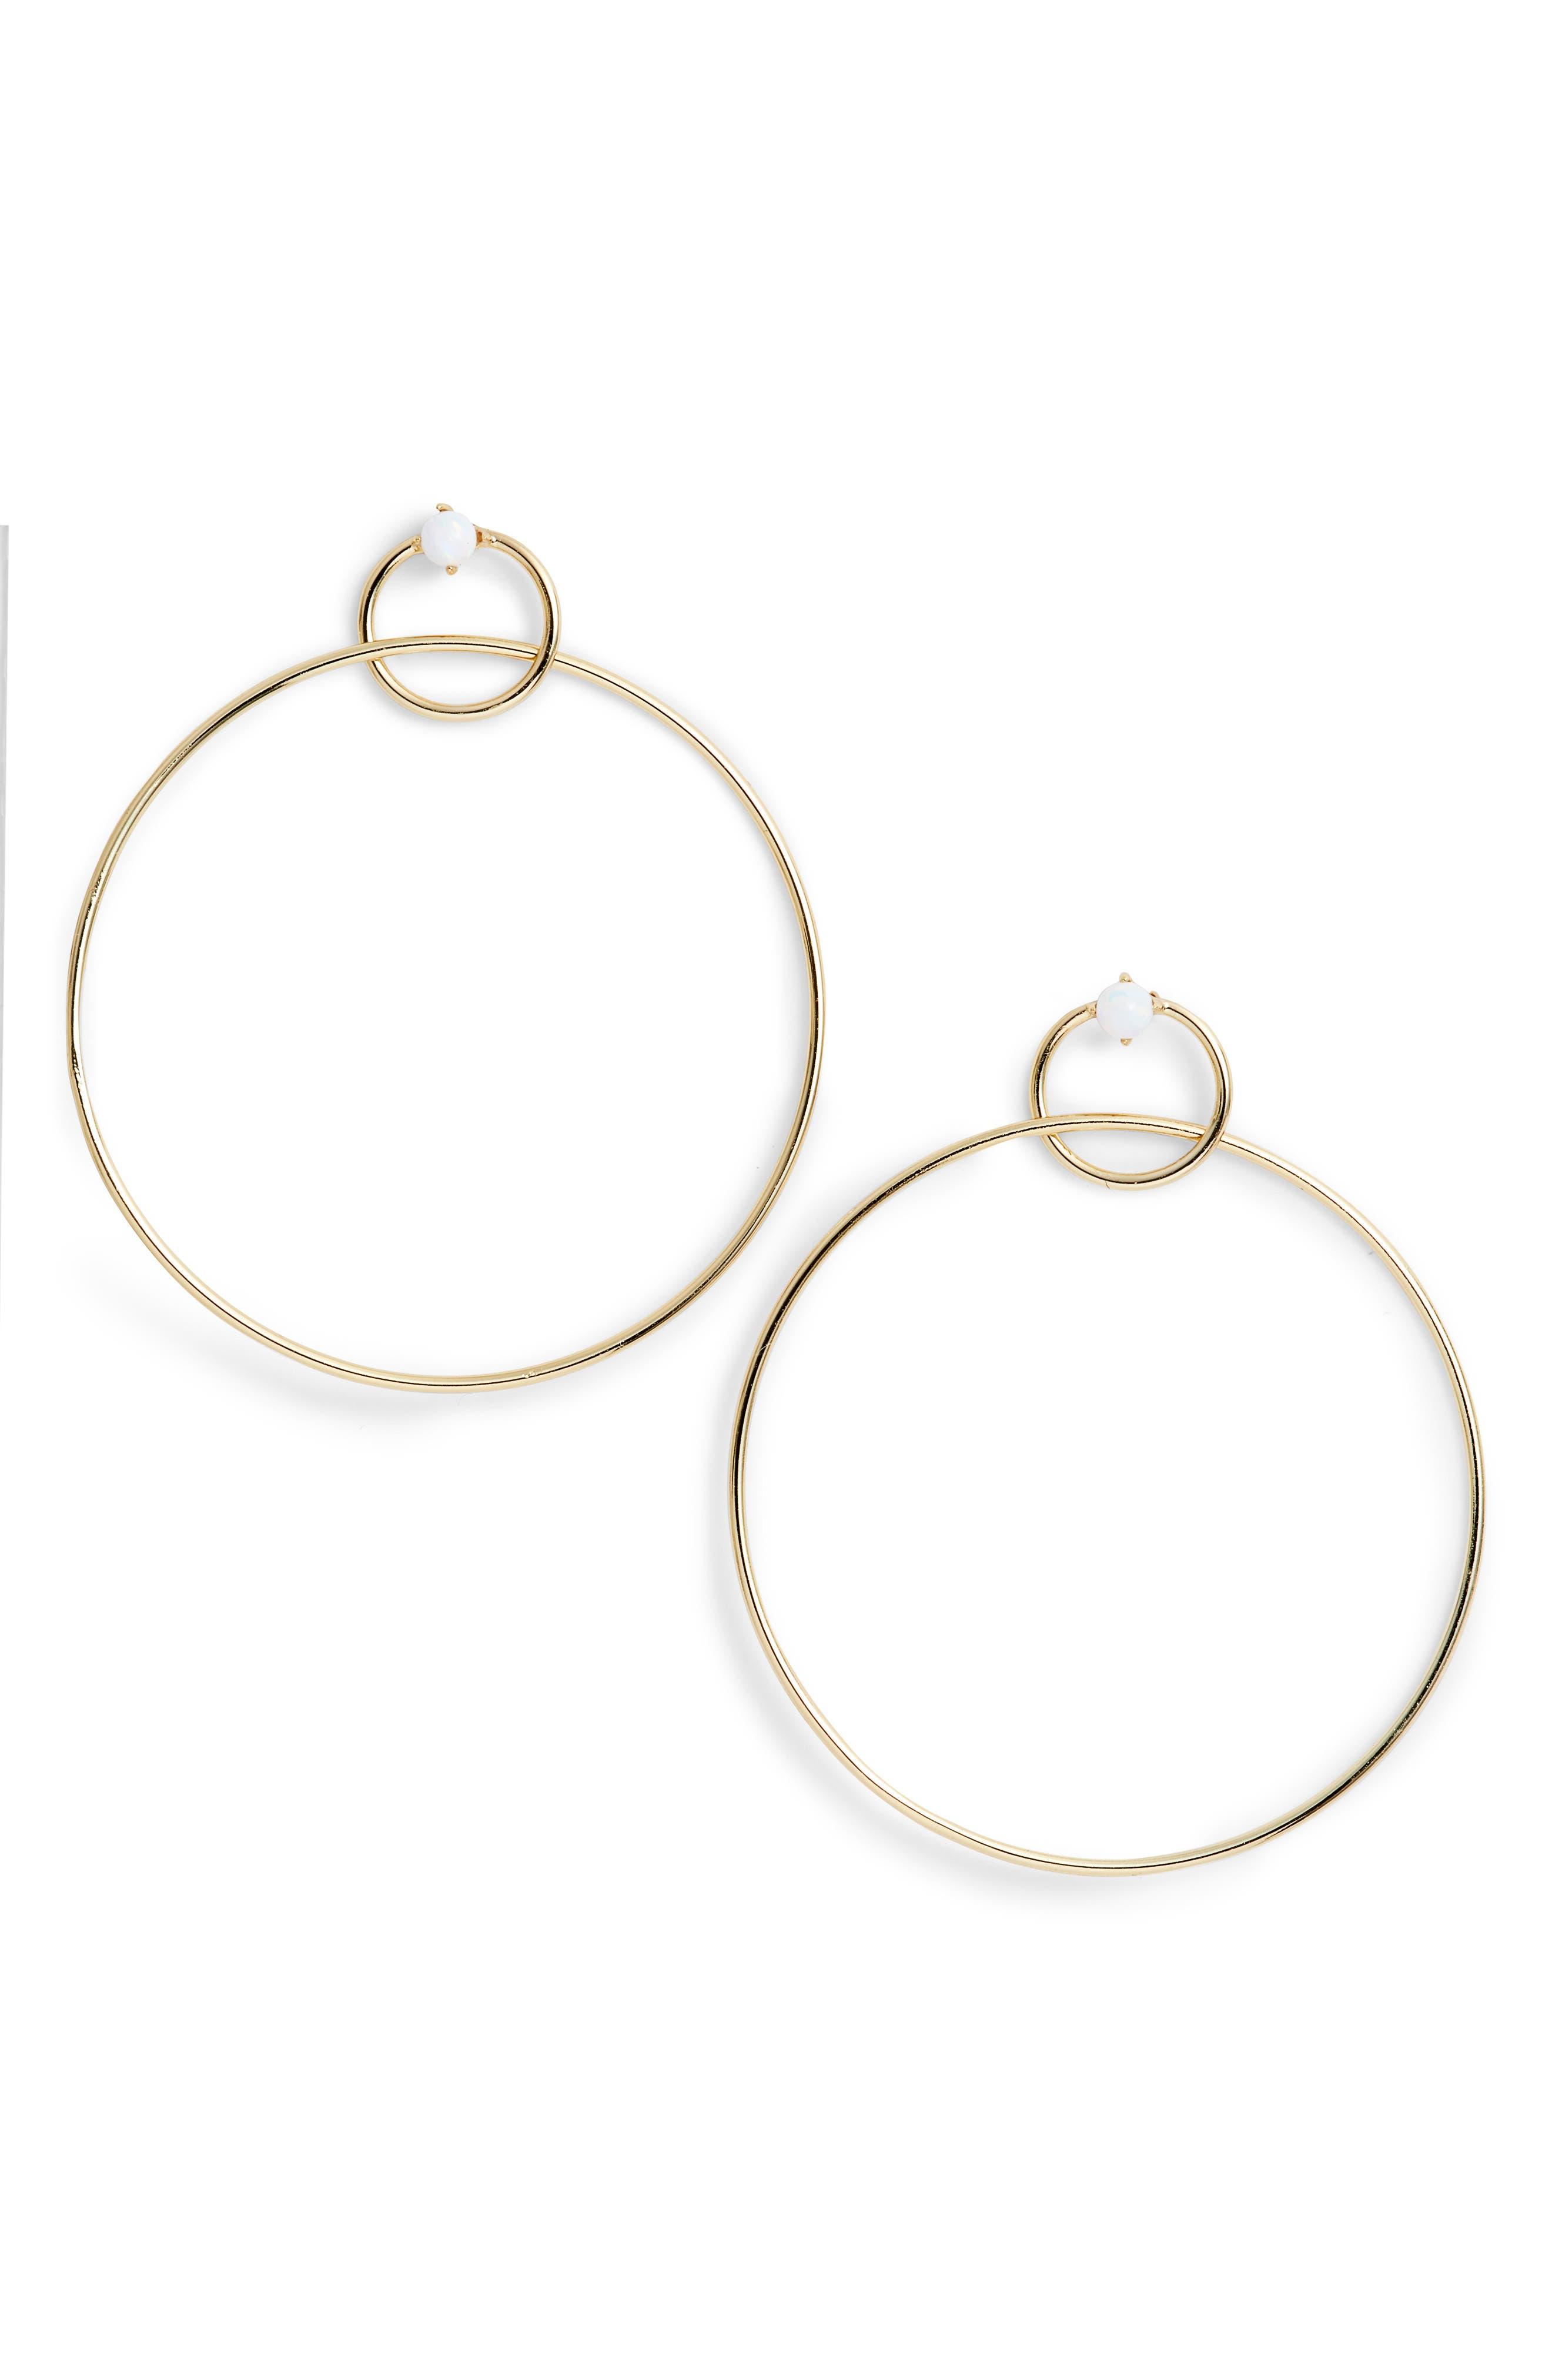 Argento Vivo Pearl Accent Double Hoop Drop Earrings